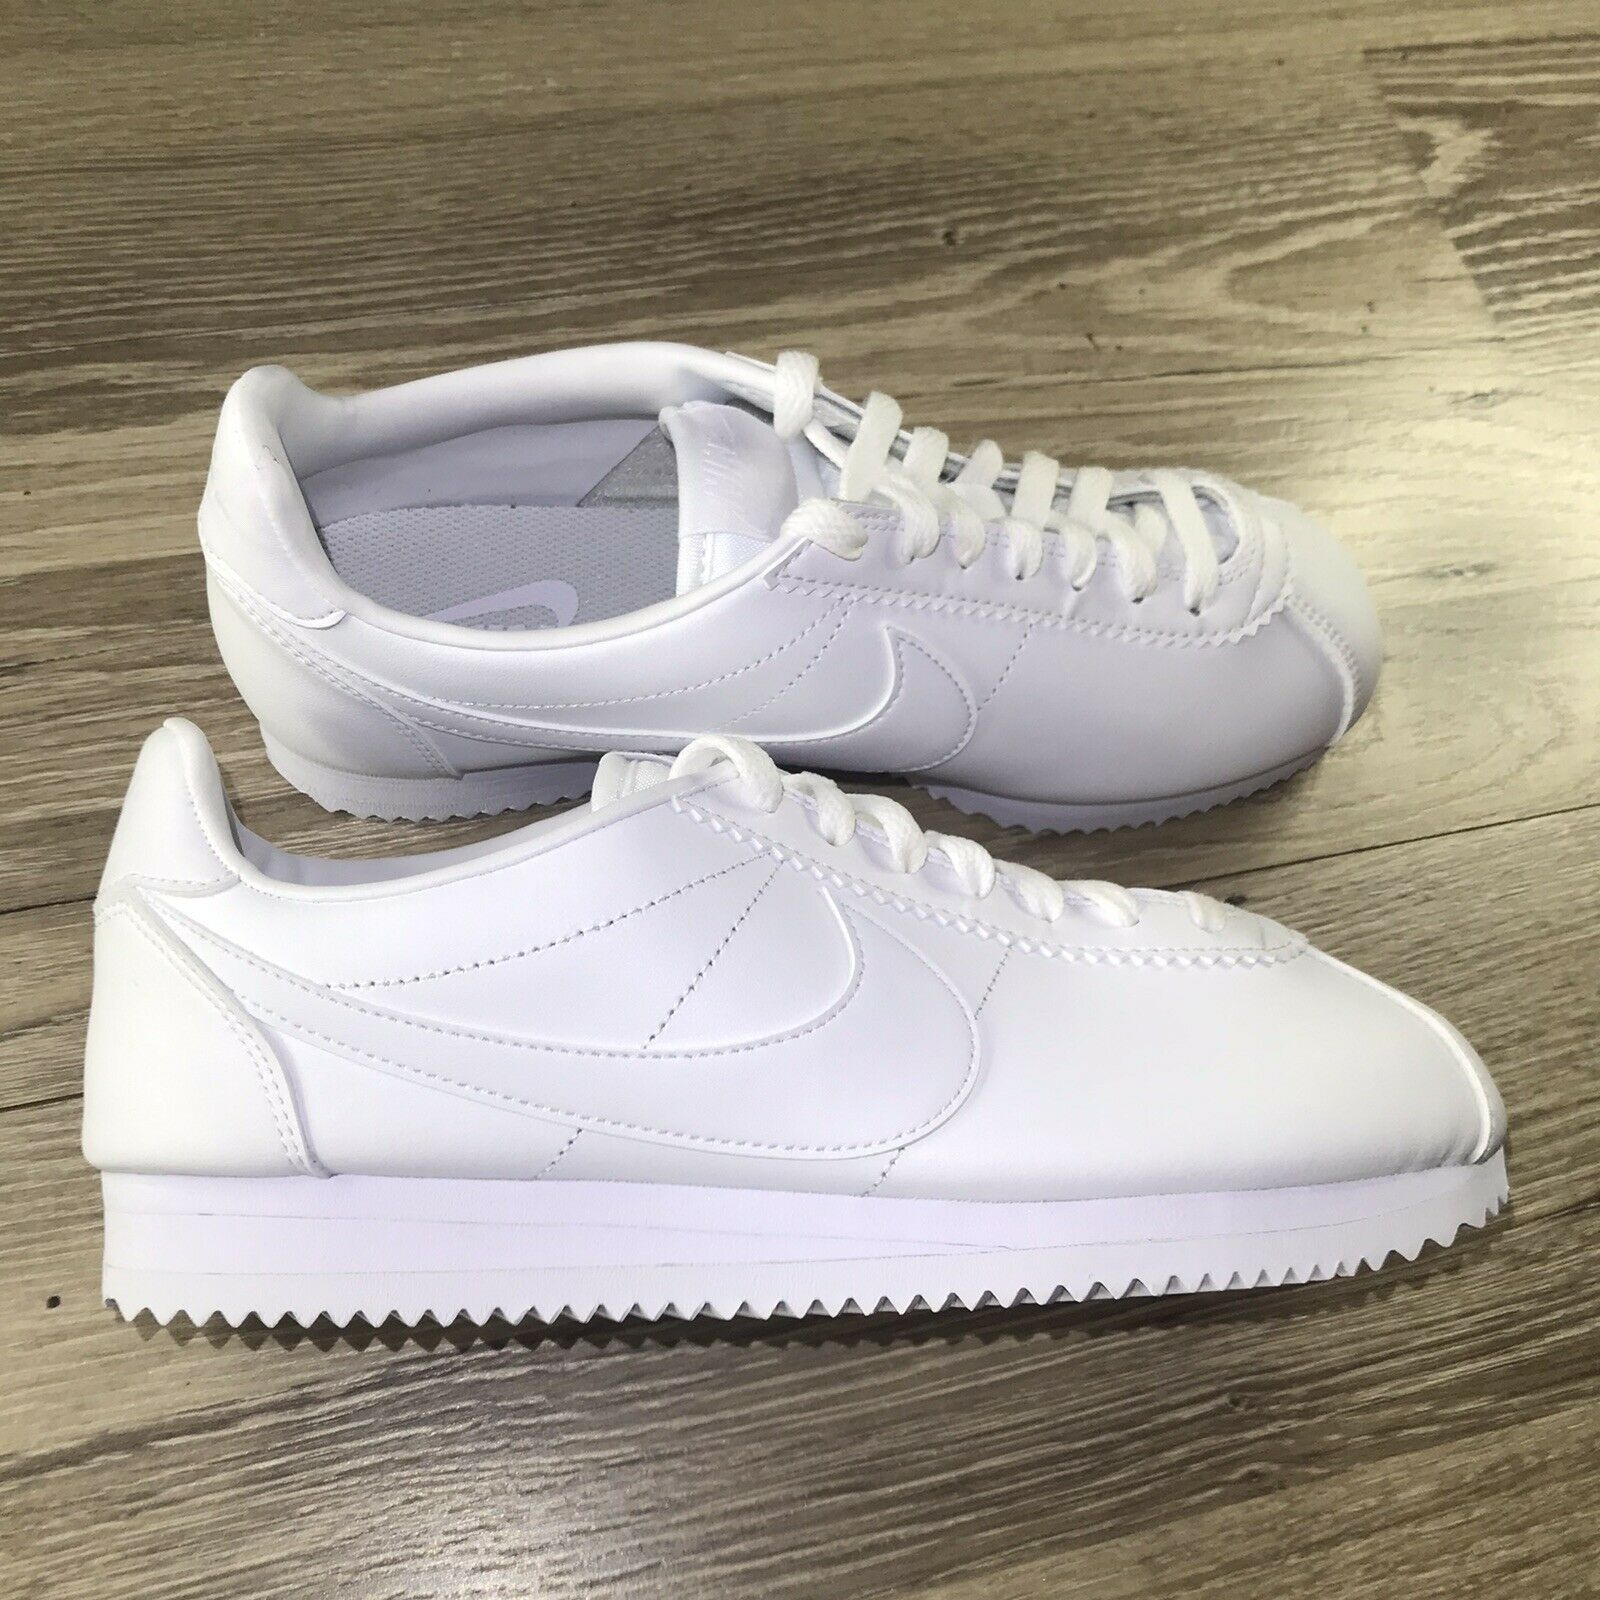 nike classic cortez leather women's shoe